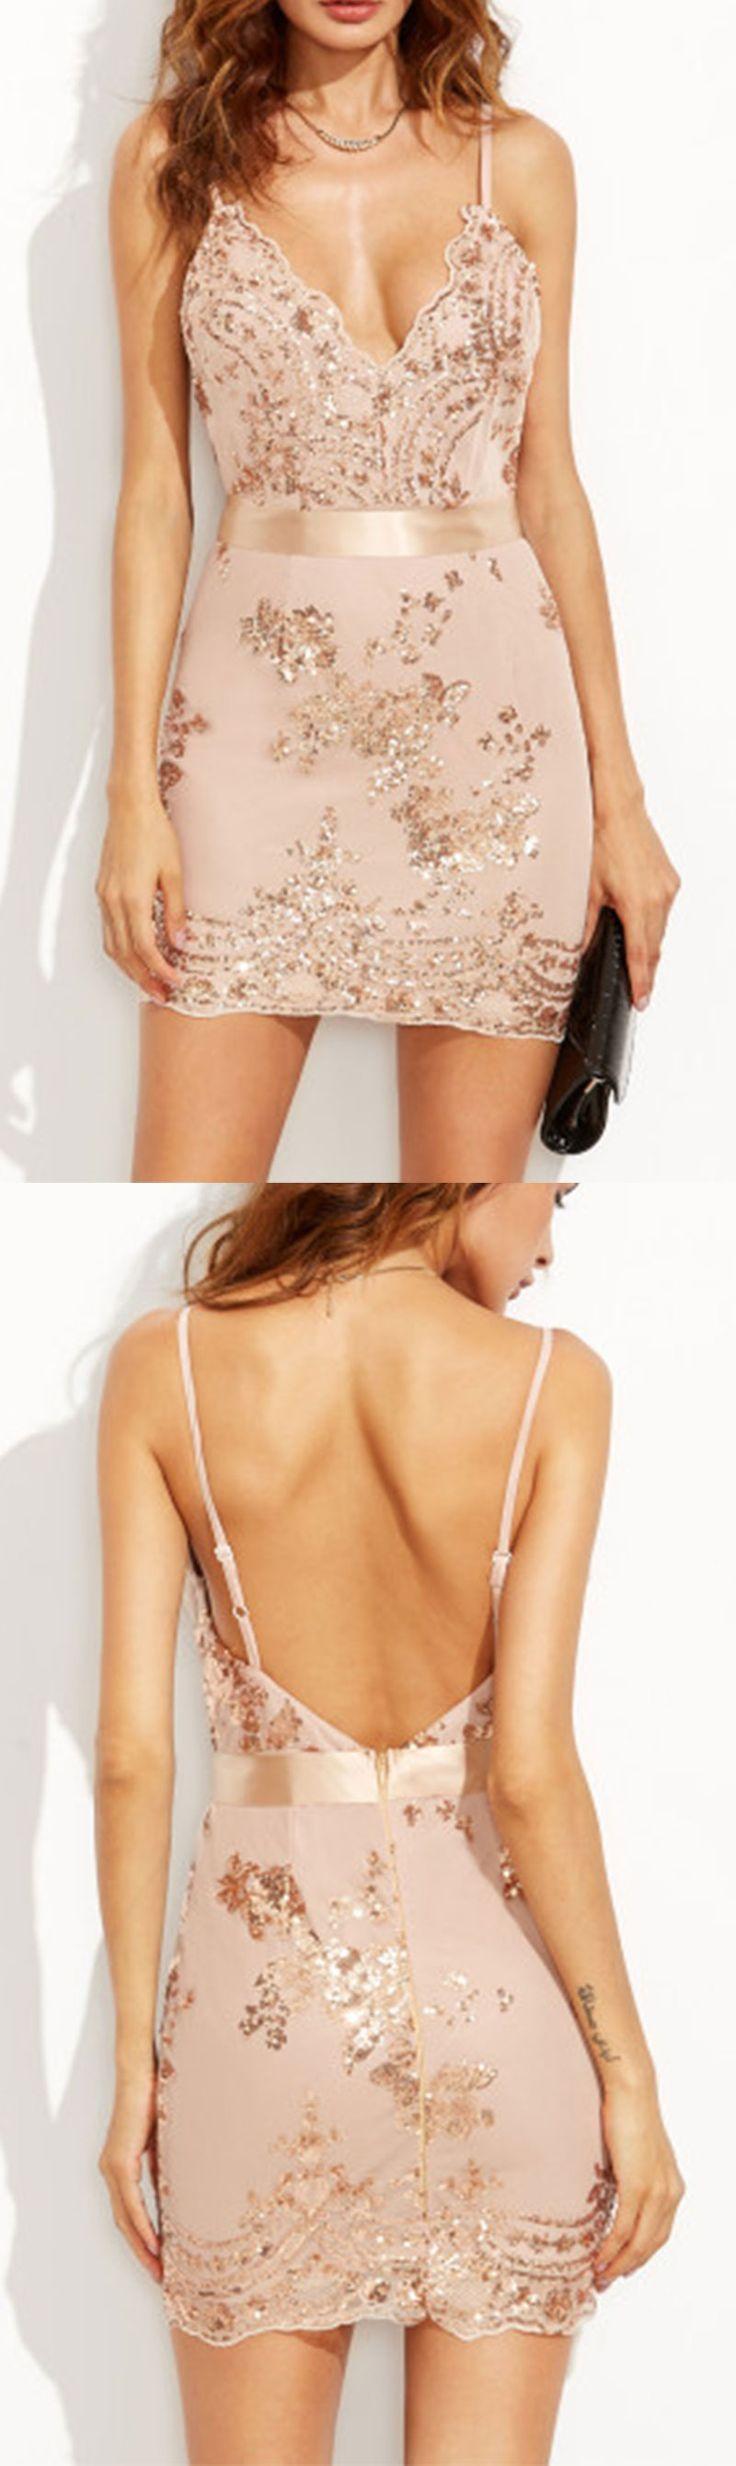 Gold spaghetti strap open back sequins bodycon dress shein